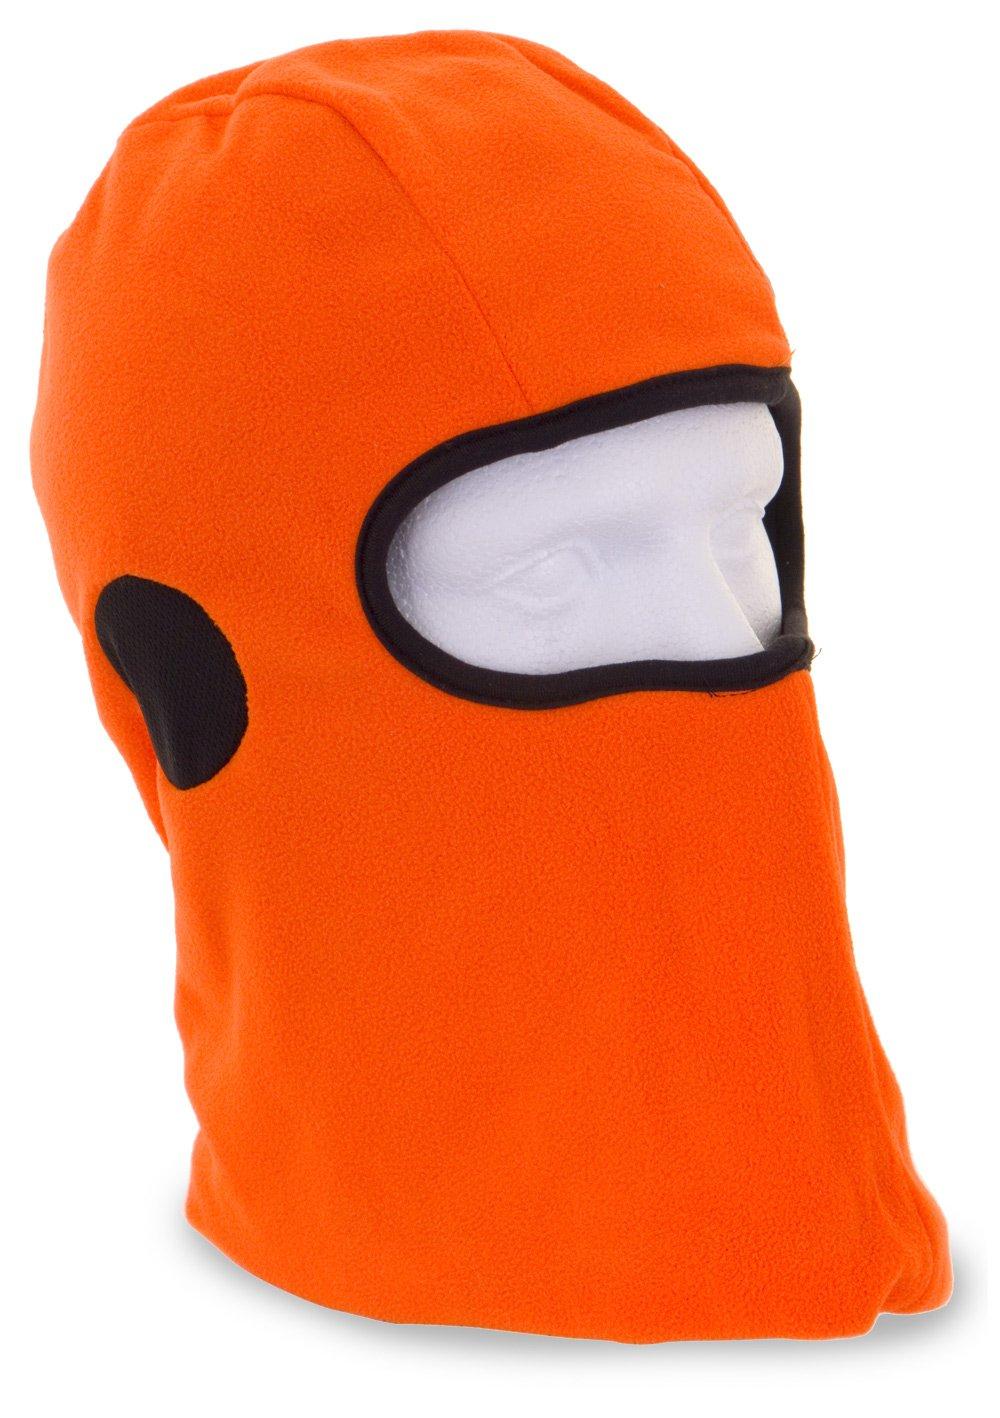 Passamontagna in Thinsulate arancione